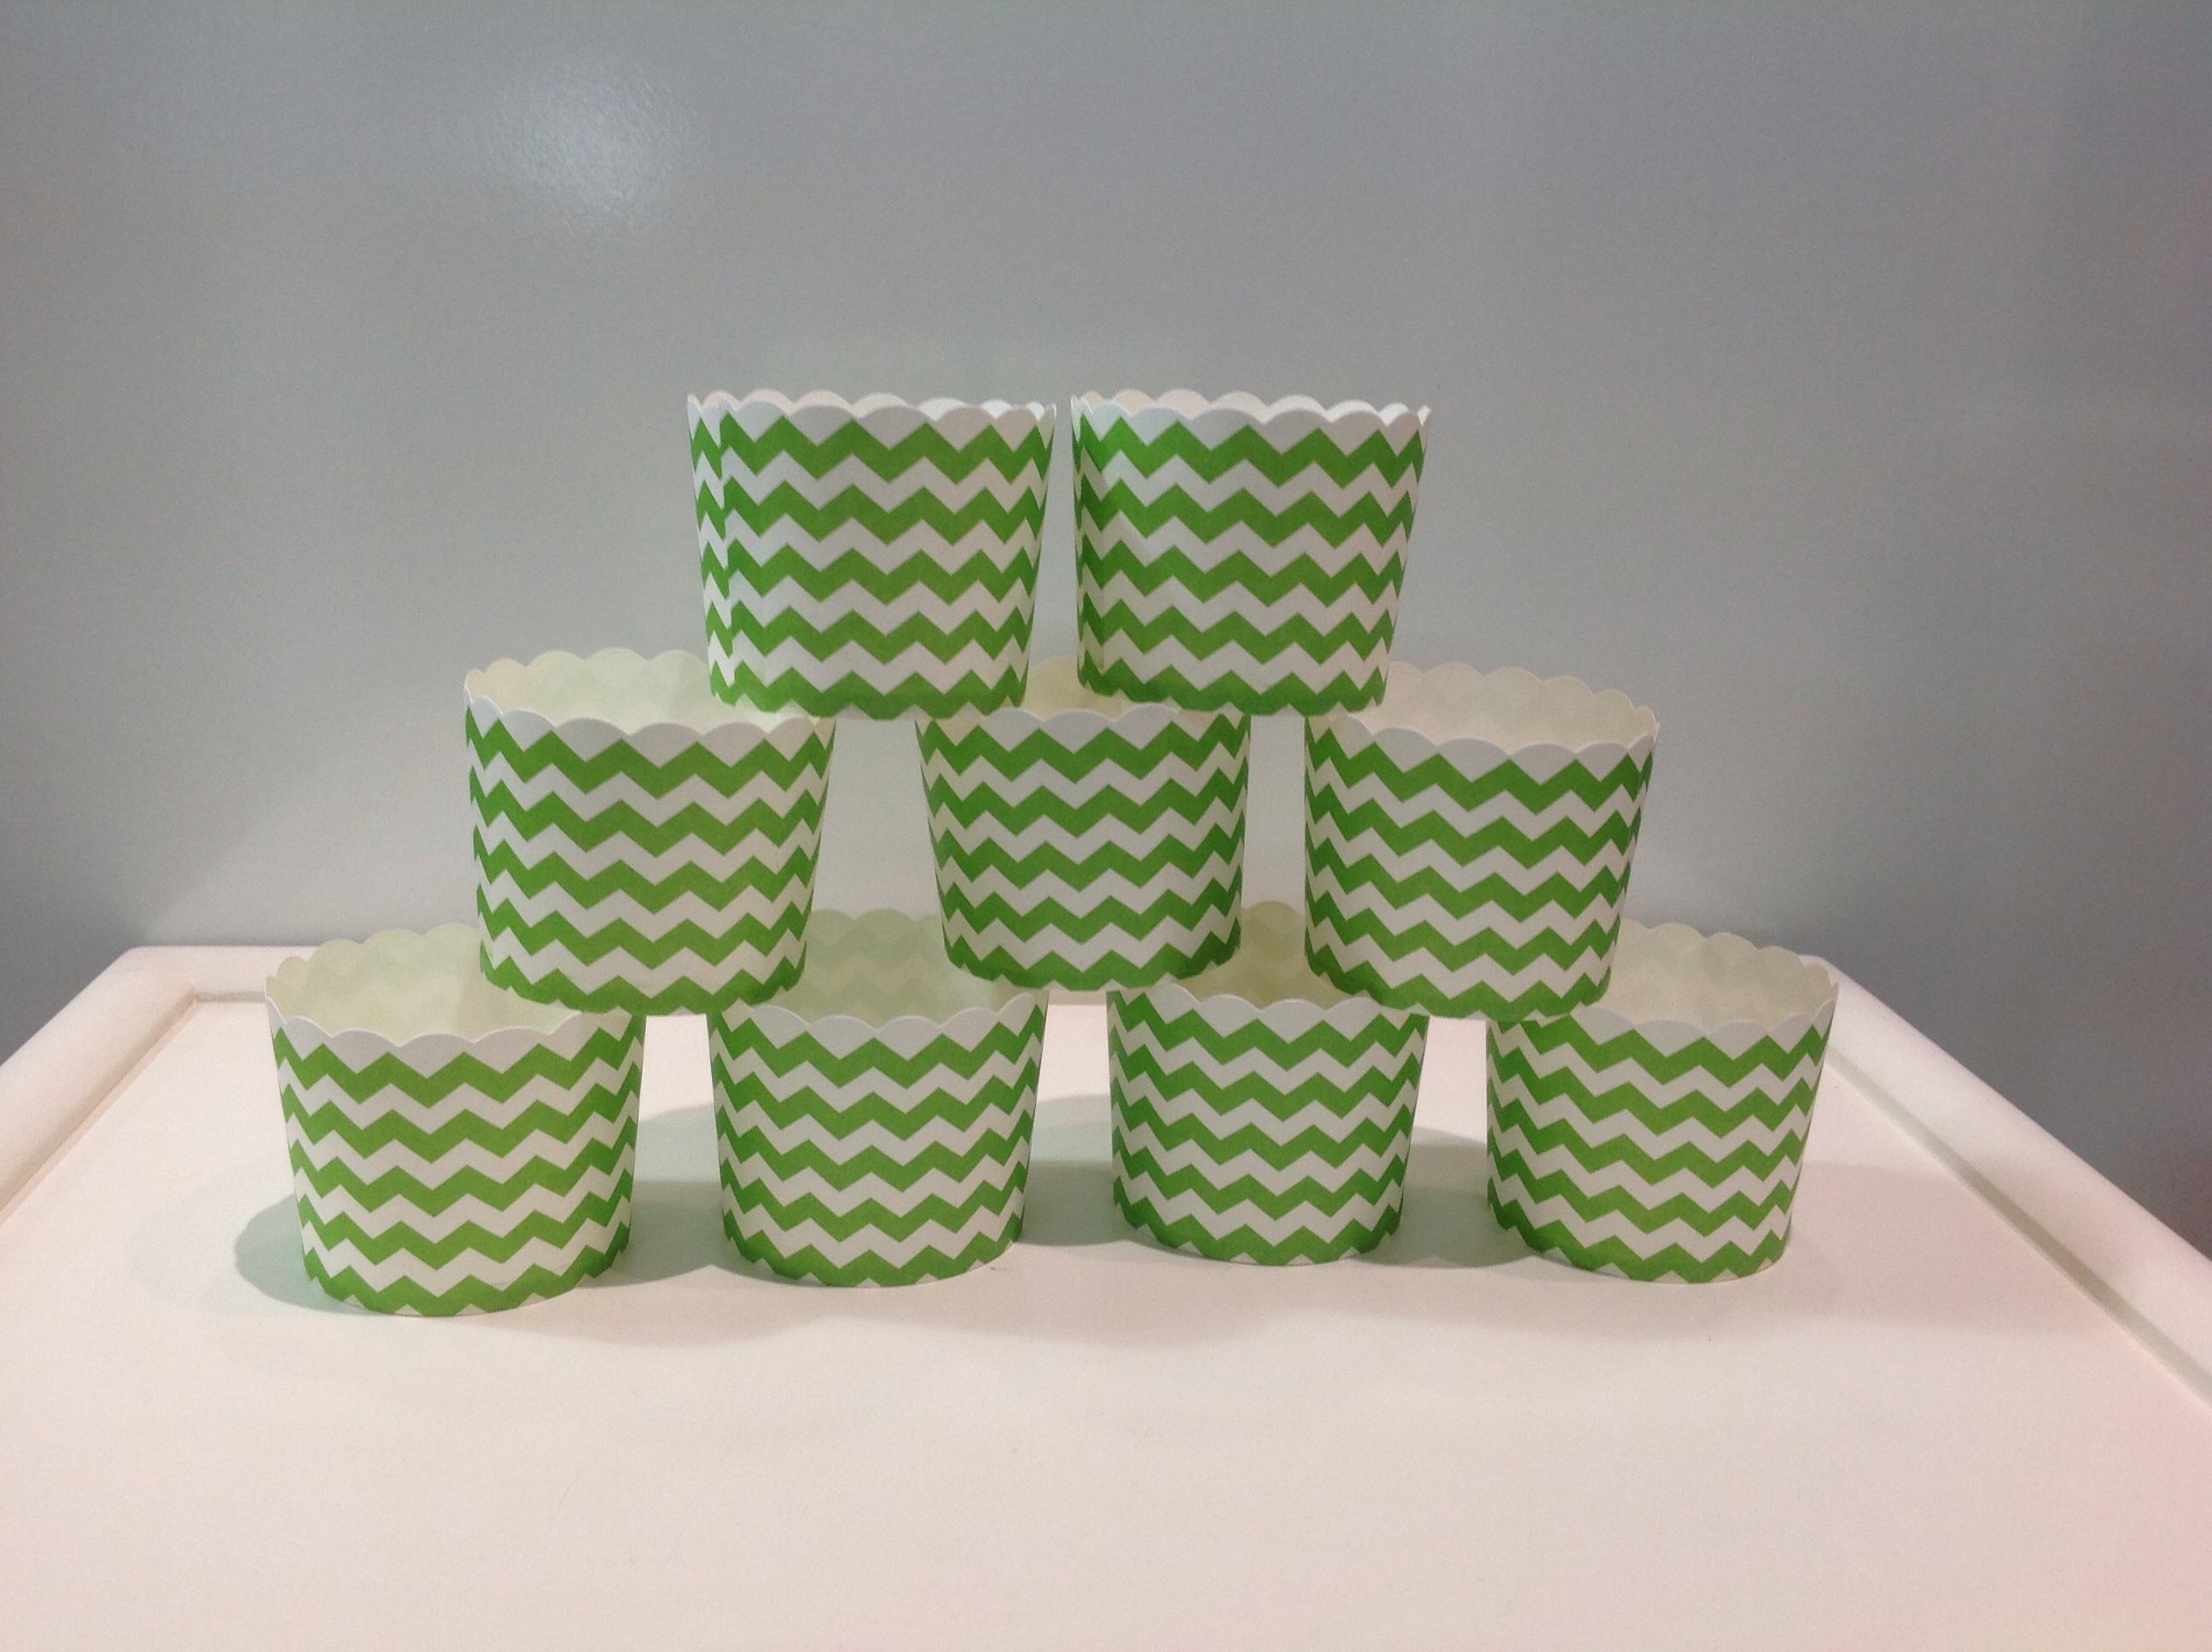 Medium size baking cup JM87 (1*50)